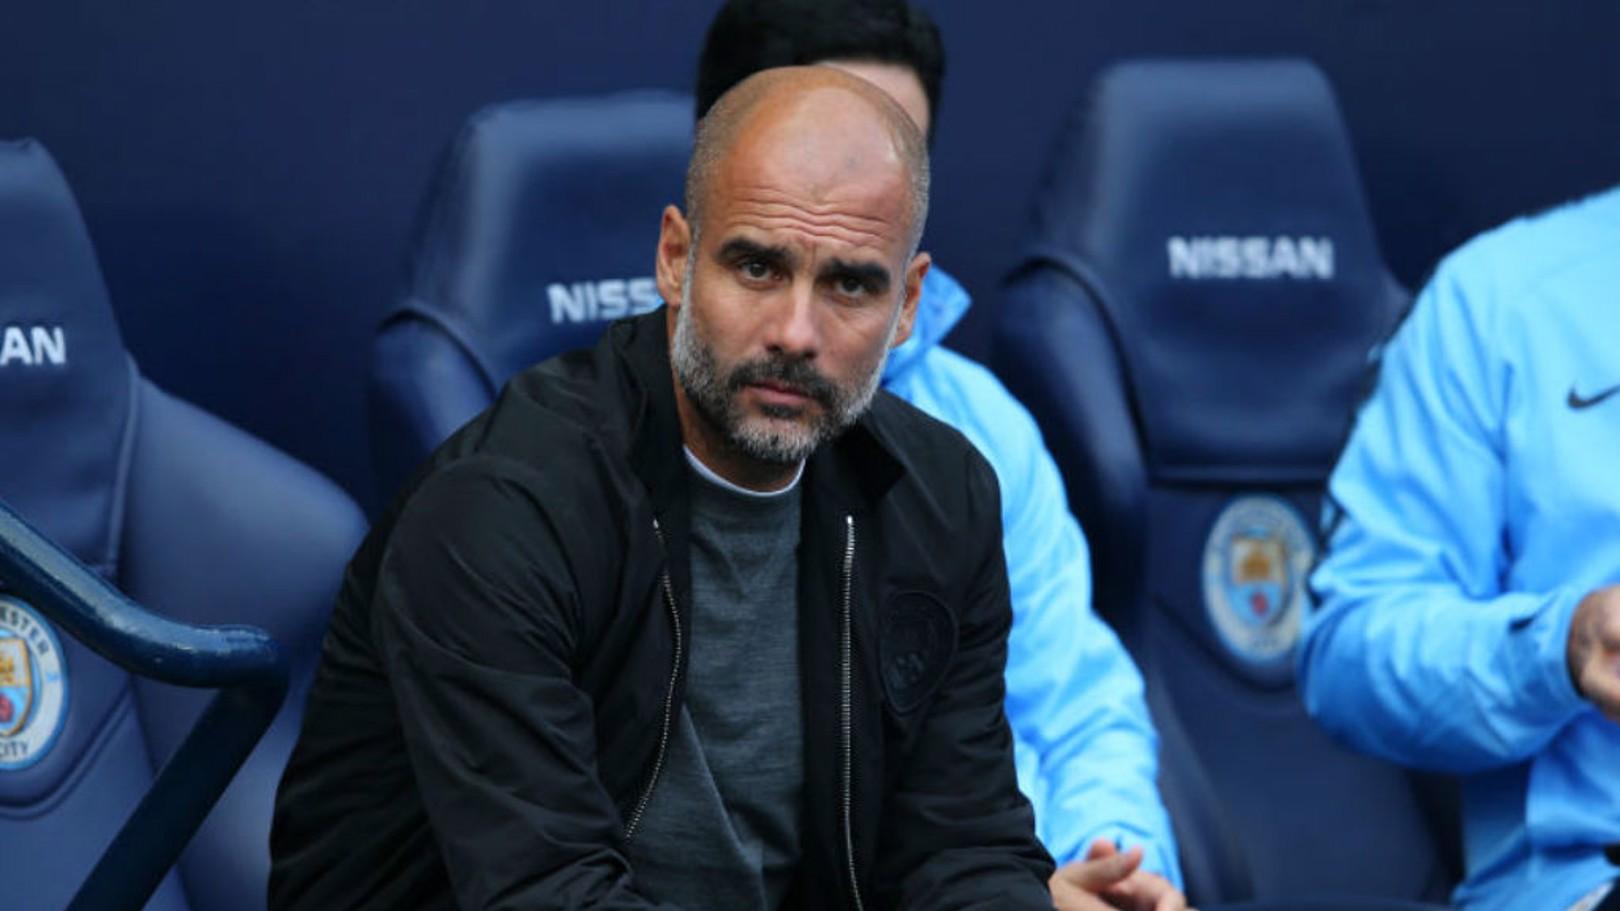 WATCHING BRIEF: Pep Guardiola keeps an eye on proceedings during the game against Burnley